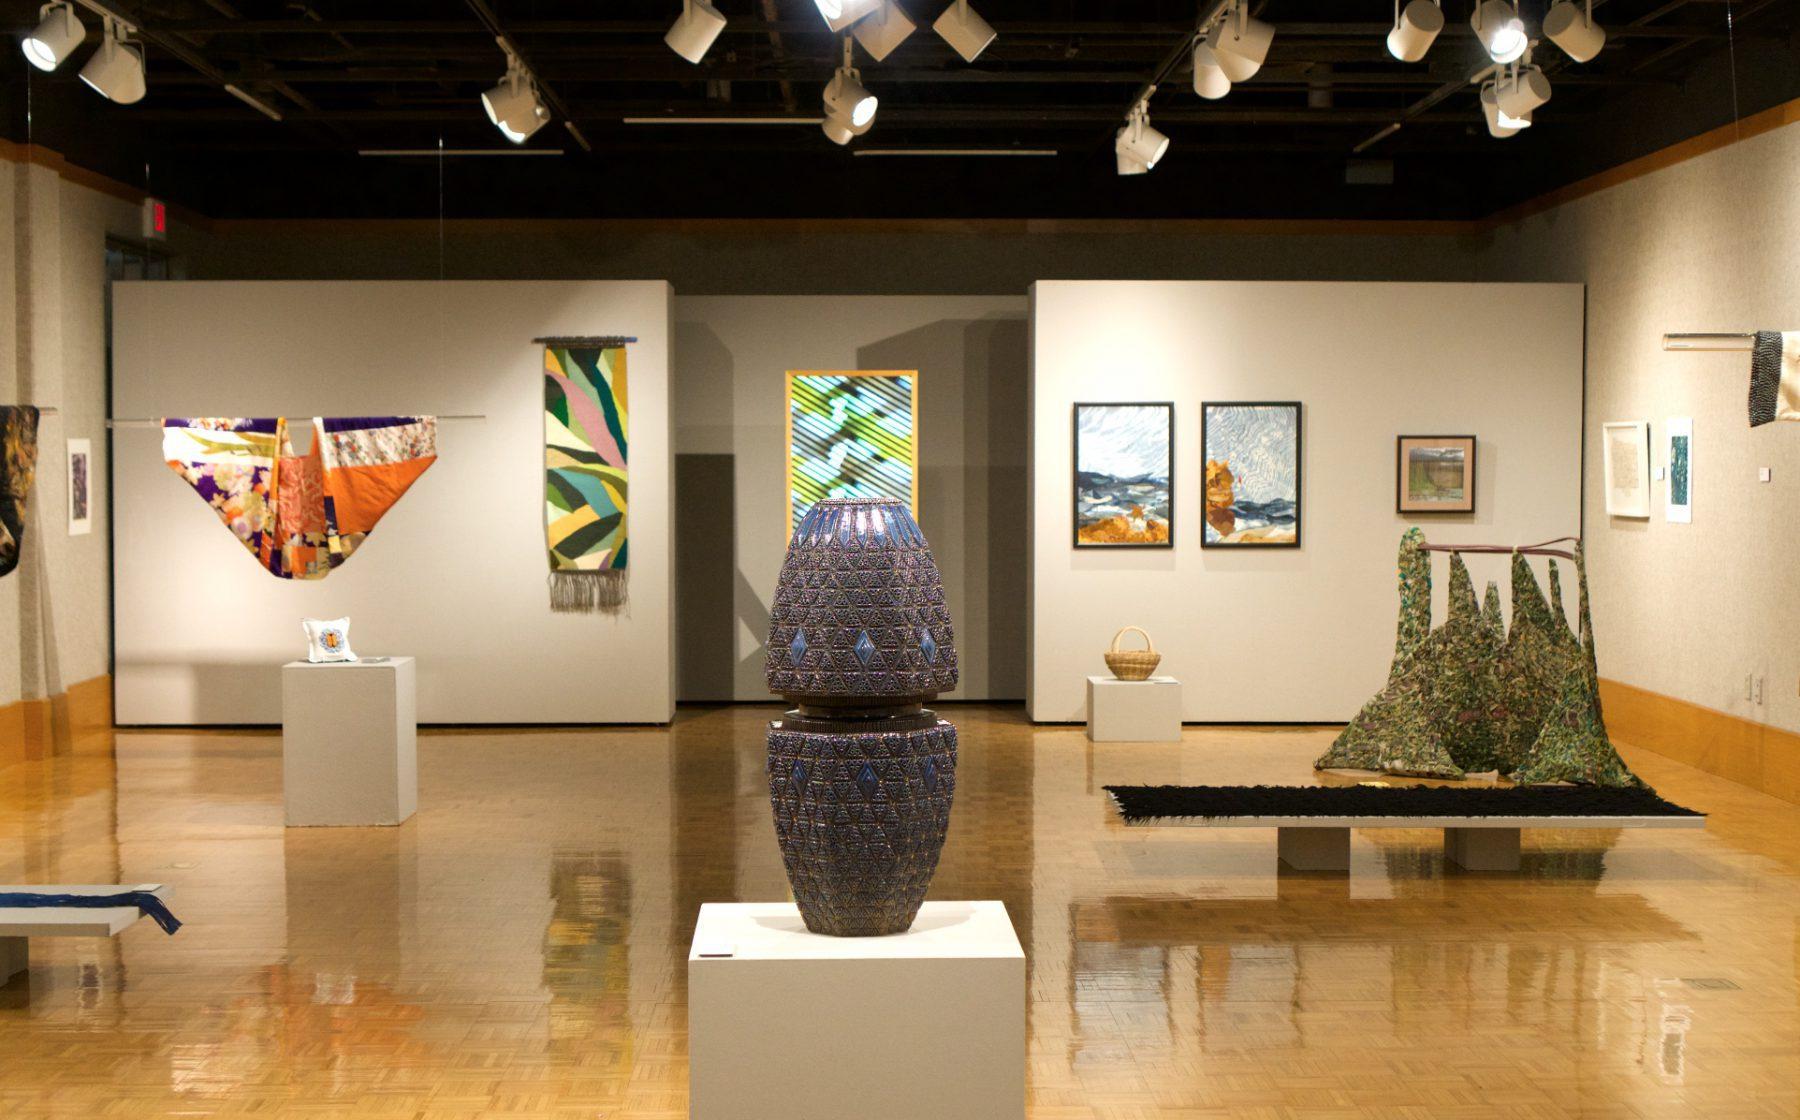 Gallery ʻIolani